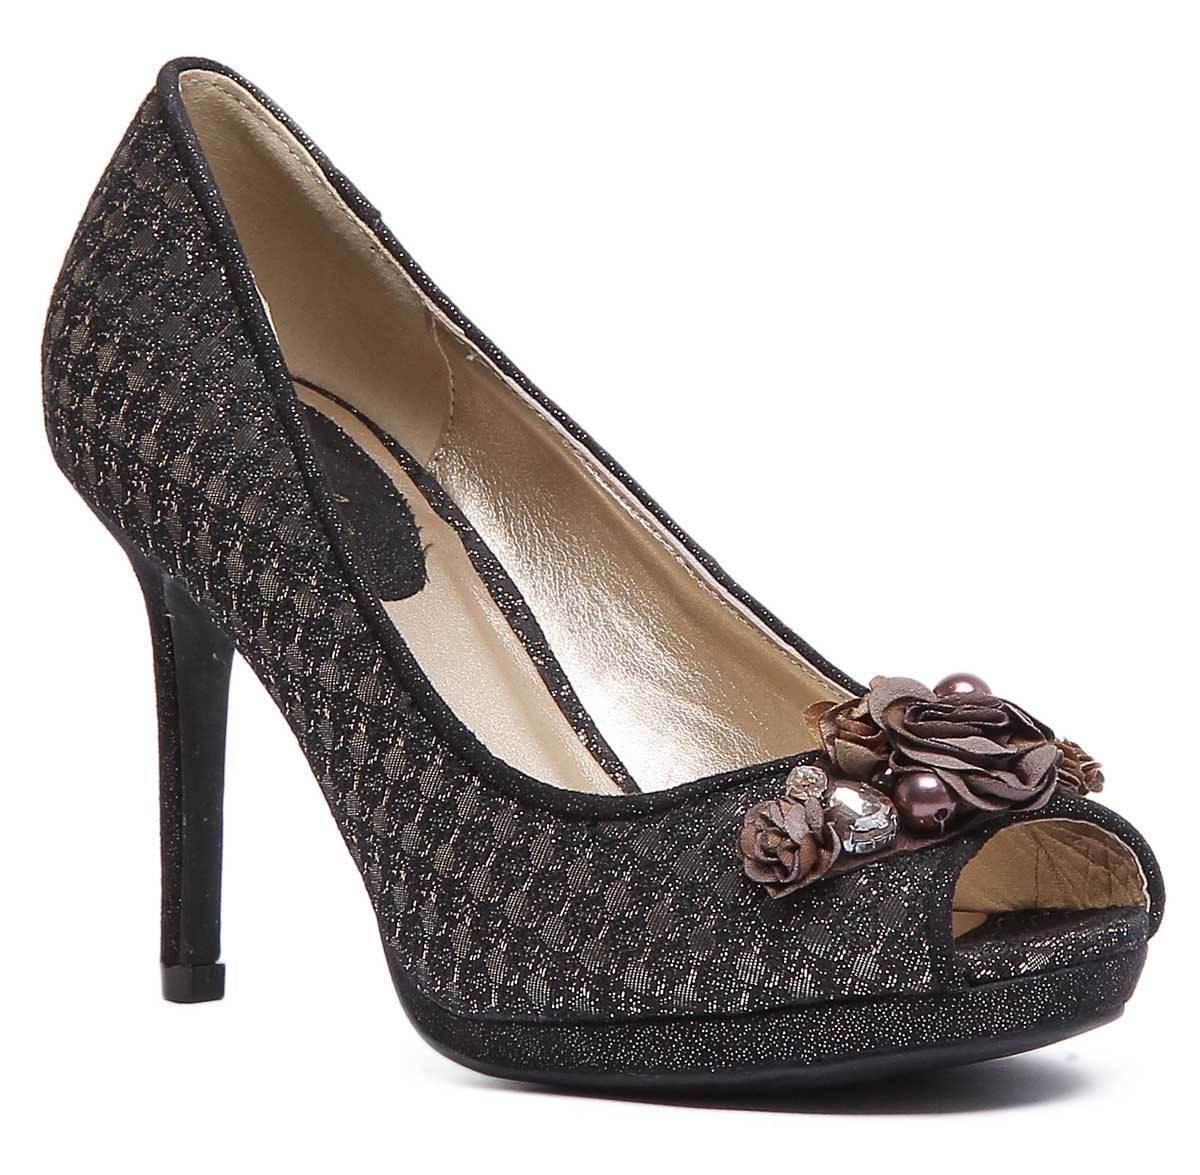 Ruby Shoo Sonia Womens Velvet Bronze Peep Toe High Heel shoes UK Size 3 - 8